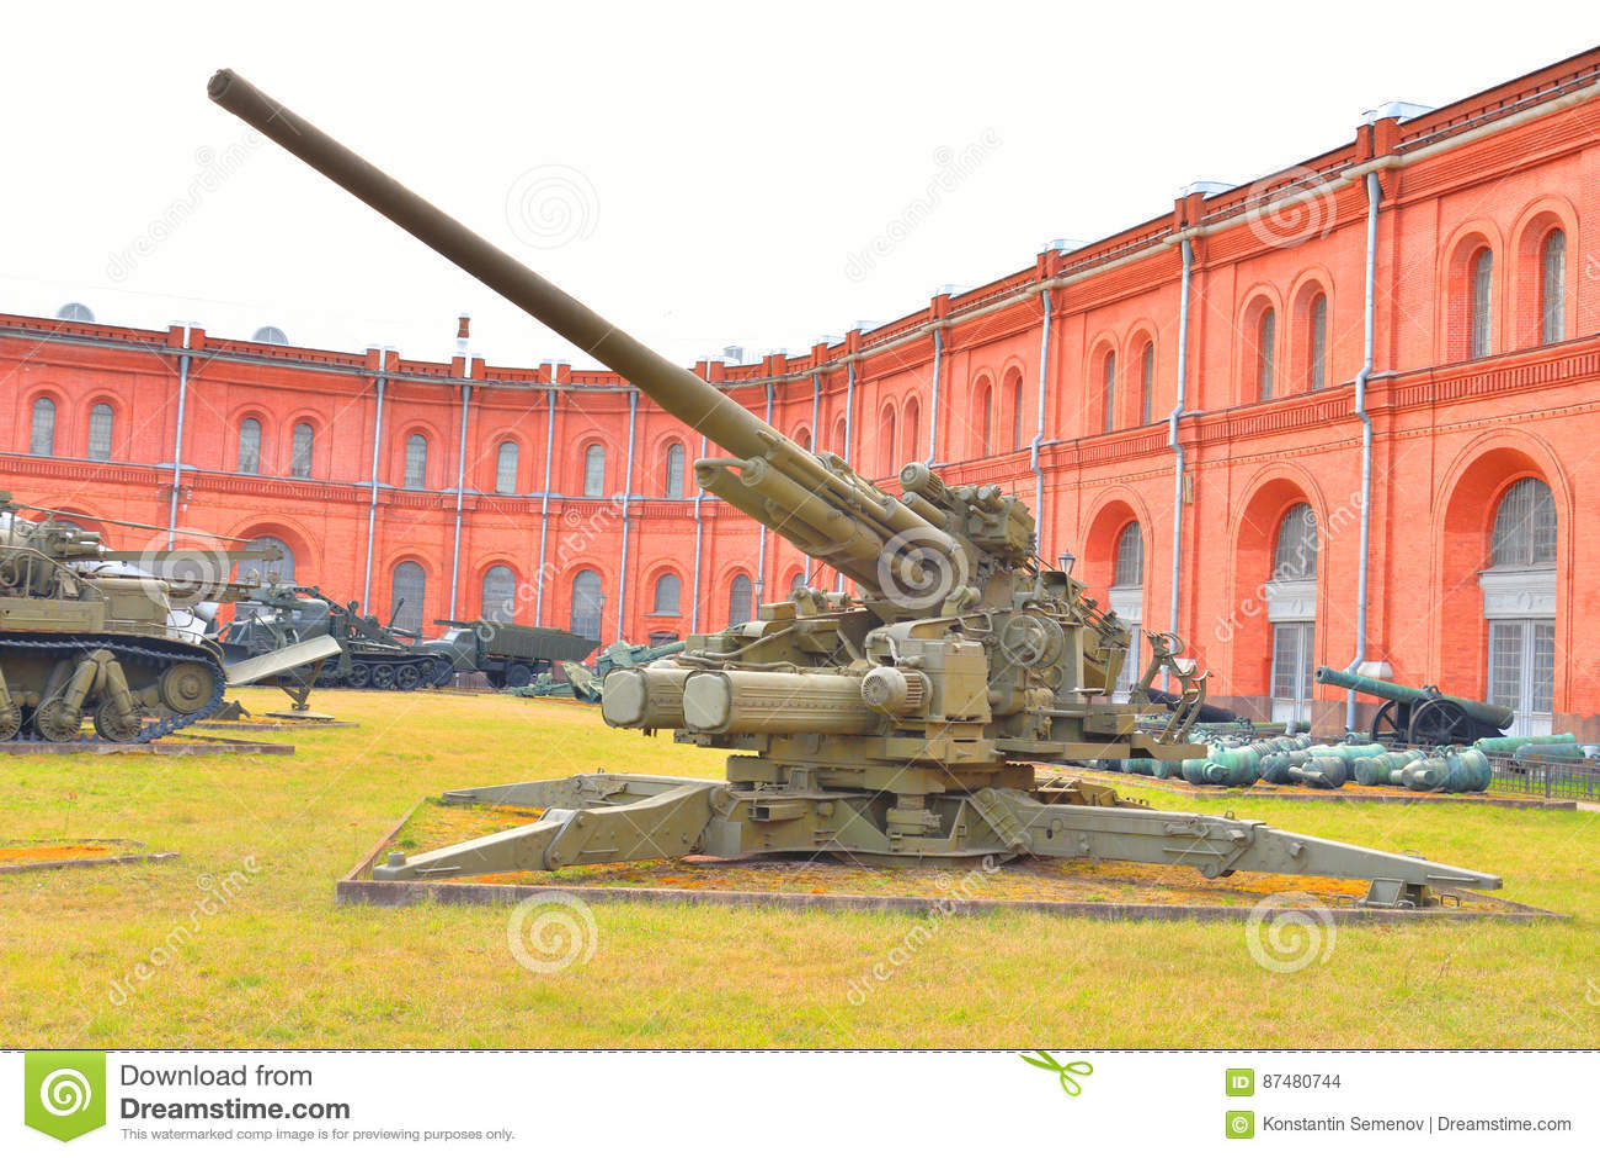 130mm luchtafweerkanon ks-30 in Militair Artilleriemuseum